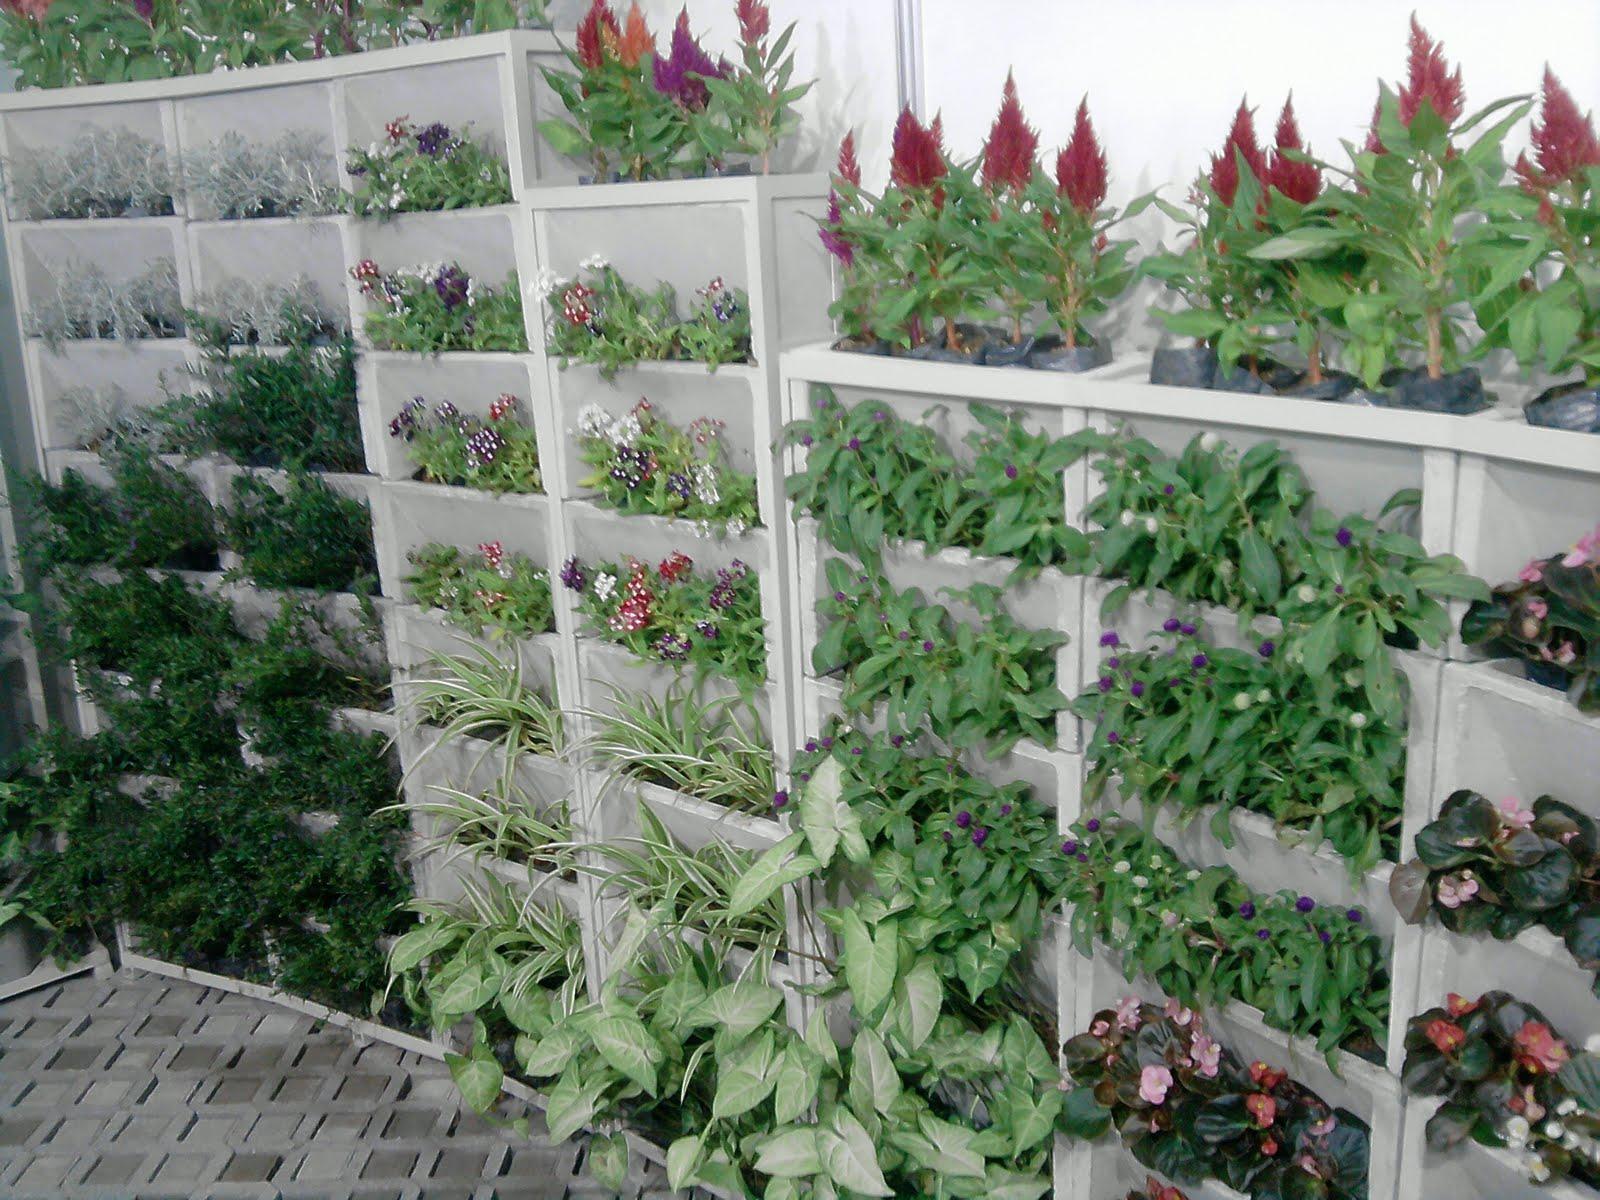 jardim vertical tijolo:Jardim Vertical – Vasos Ornamentais